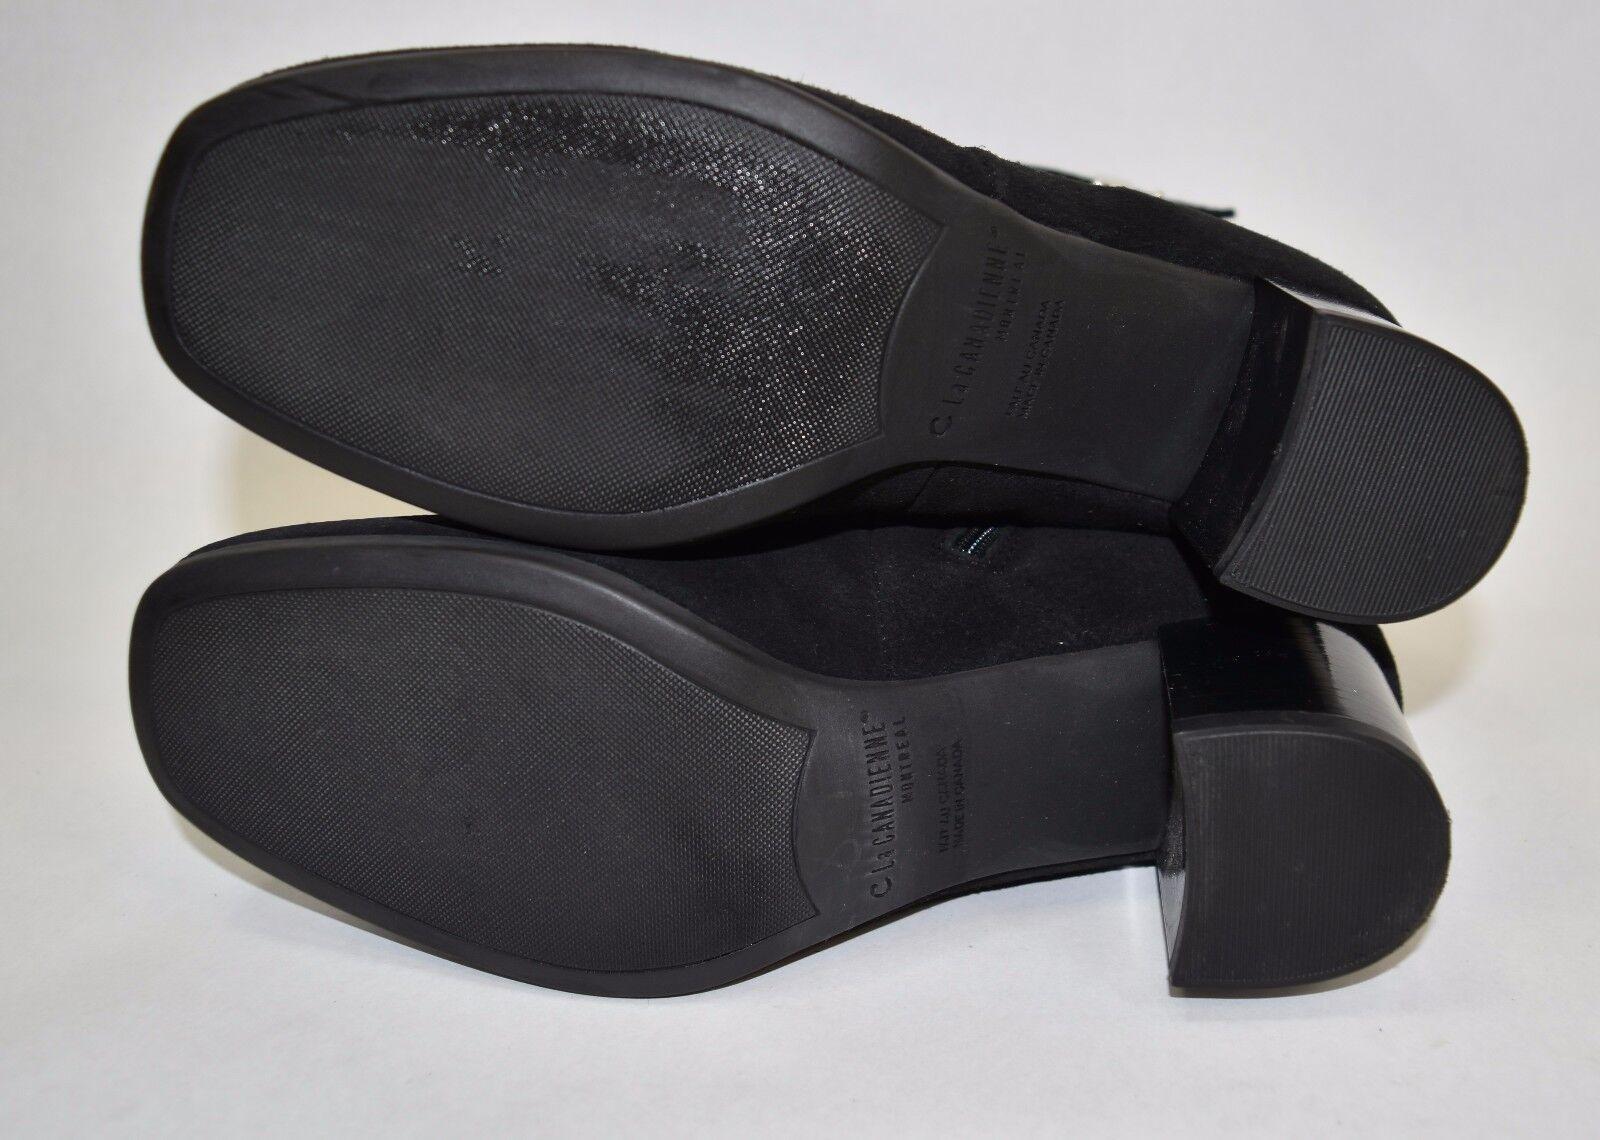 400 LA CANADIENNE Jade' Jade' Jade' Waterproof Bootie SUEDE BLACK NICE COMFORT 5.5 M (W12) 48e6dc